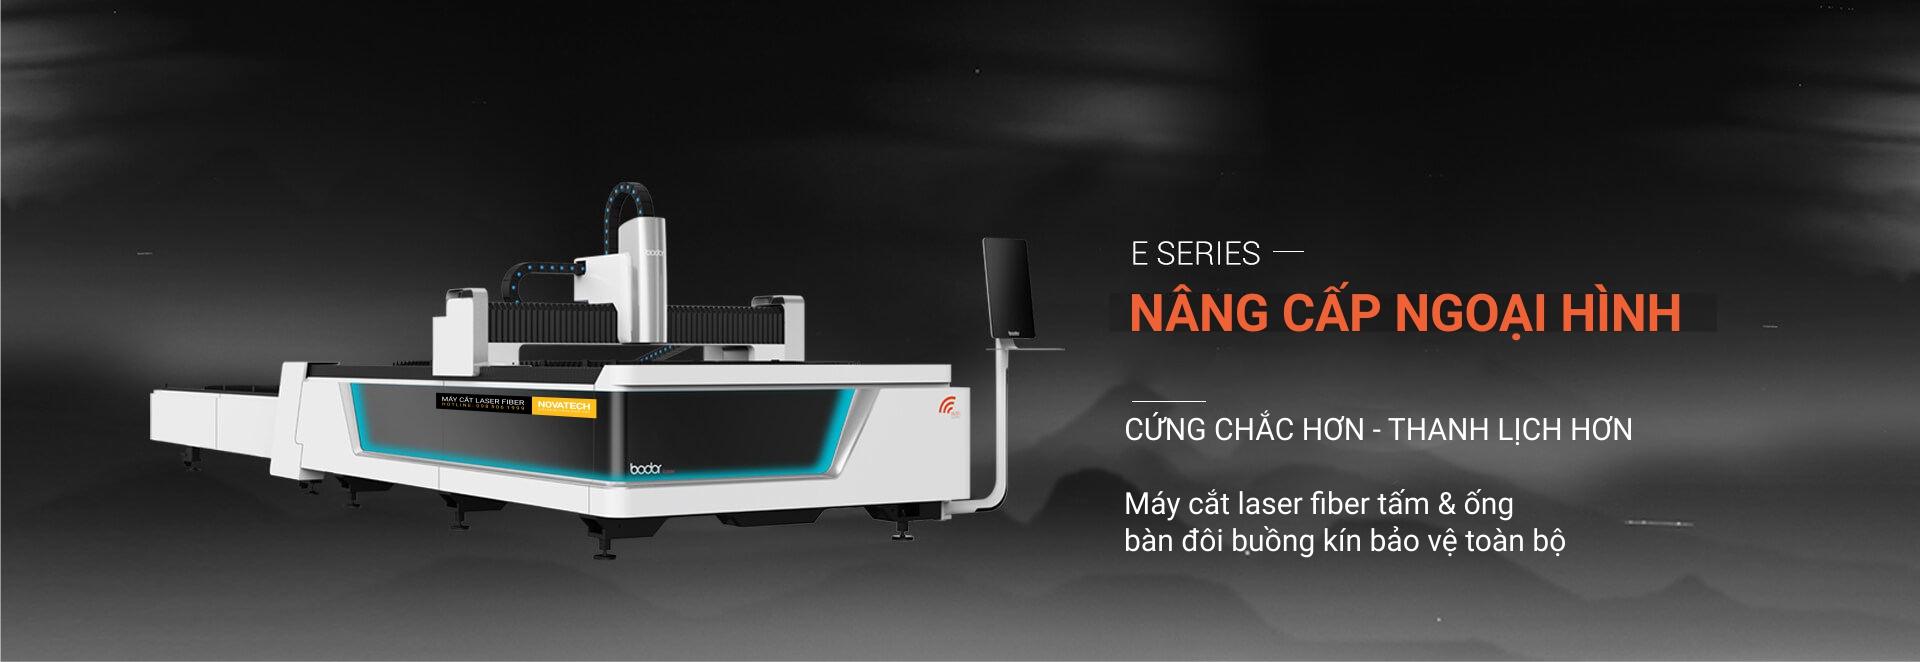 Máy cắt laser fiber bodor dòng E